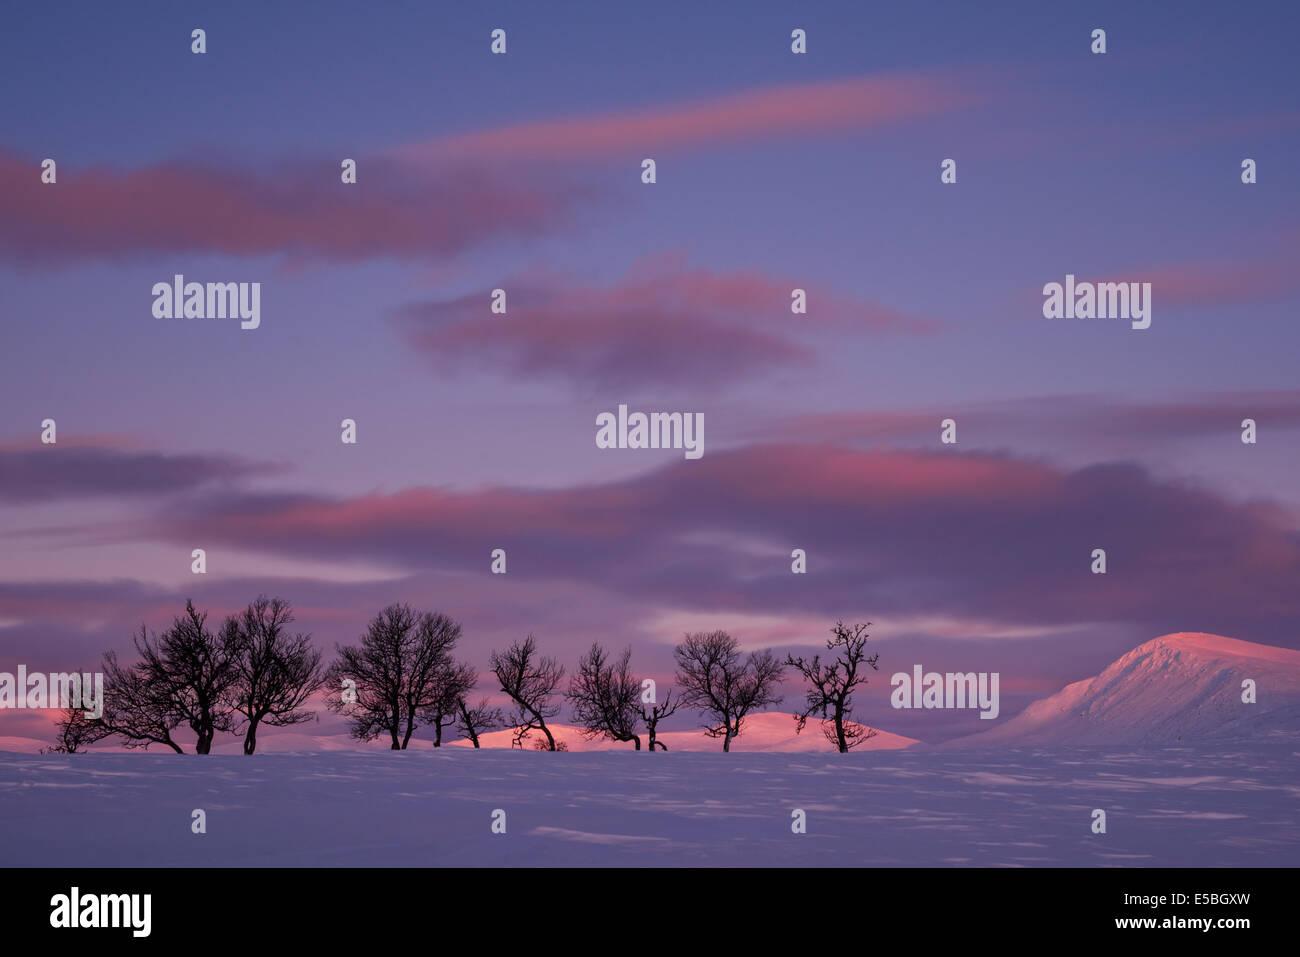 Winter landscape with dramatic sky, Dalarna, Europe - Stock Image